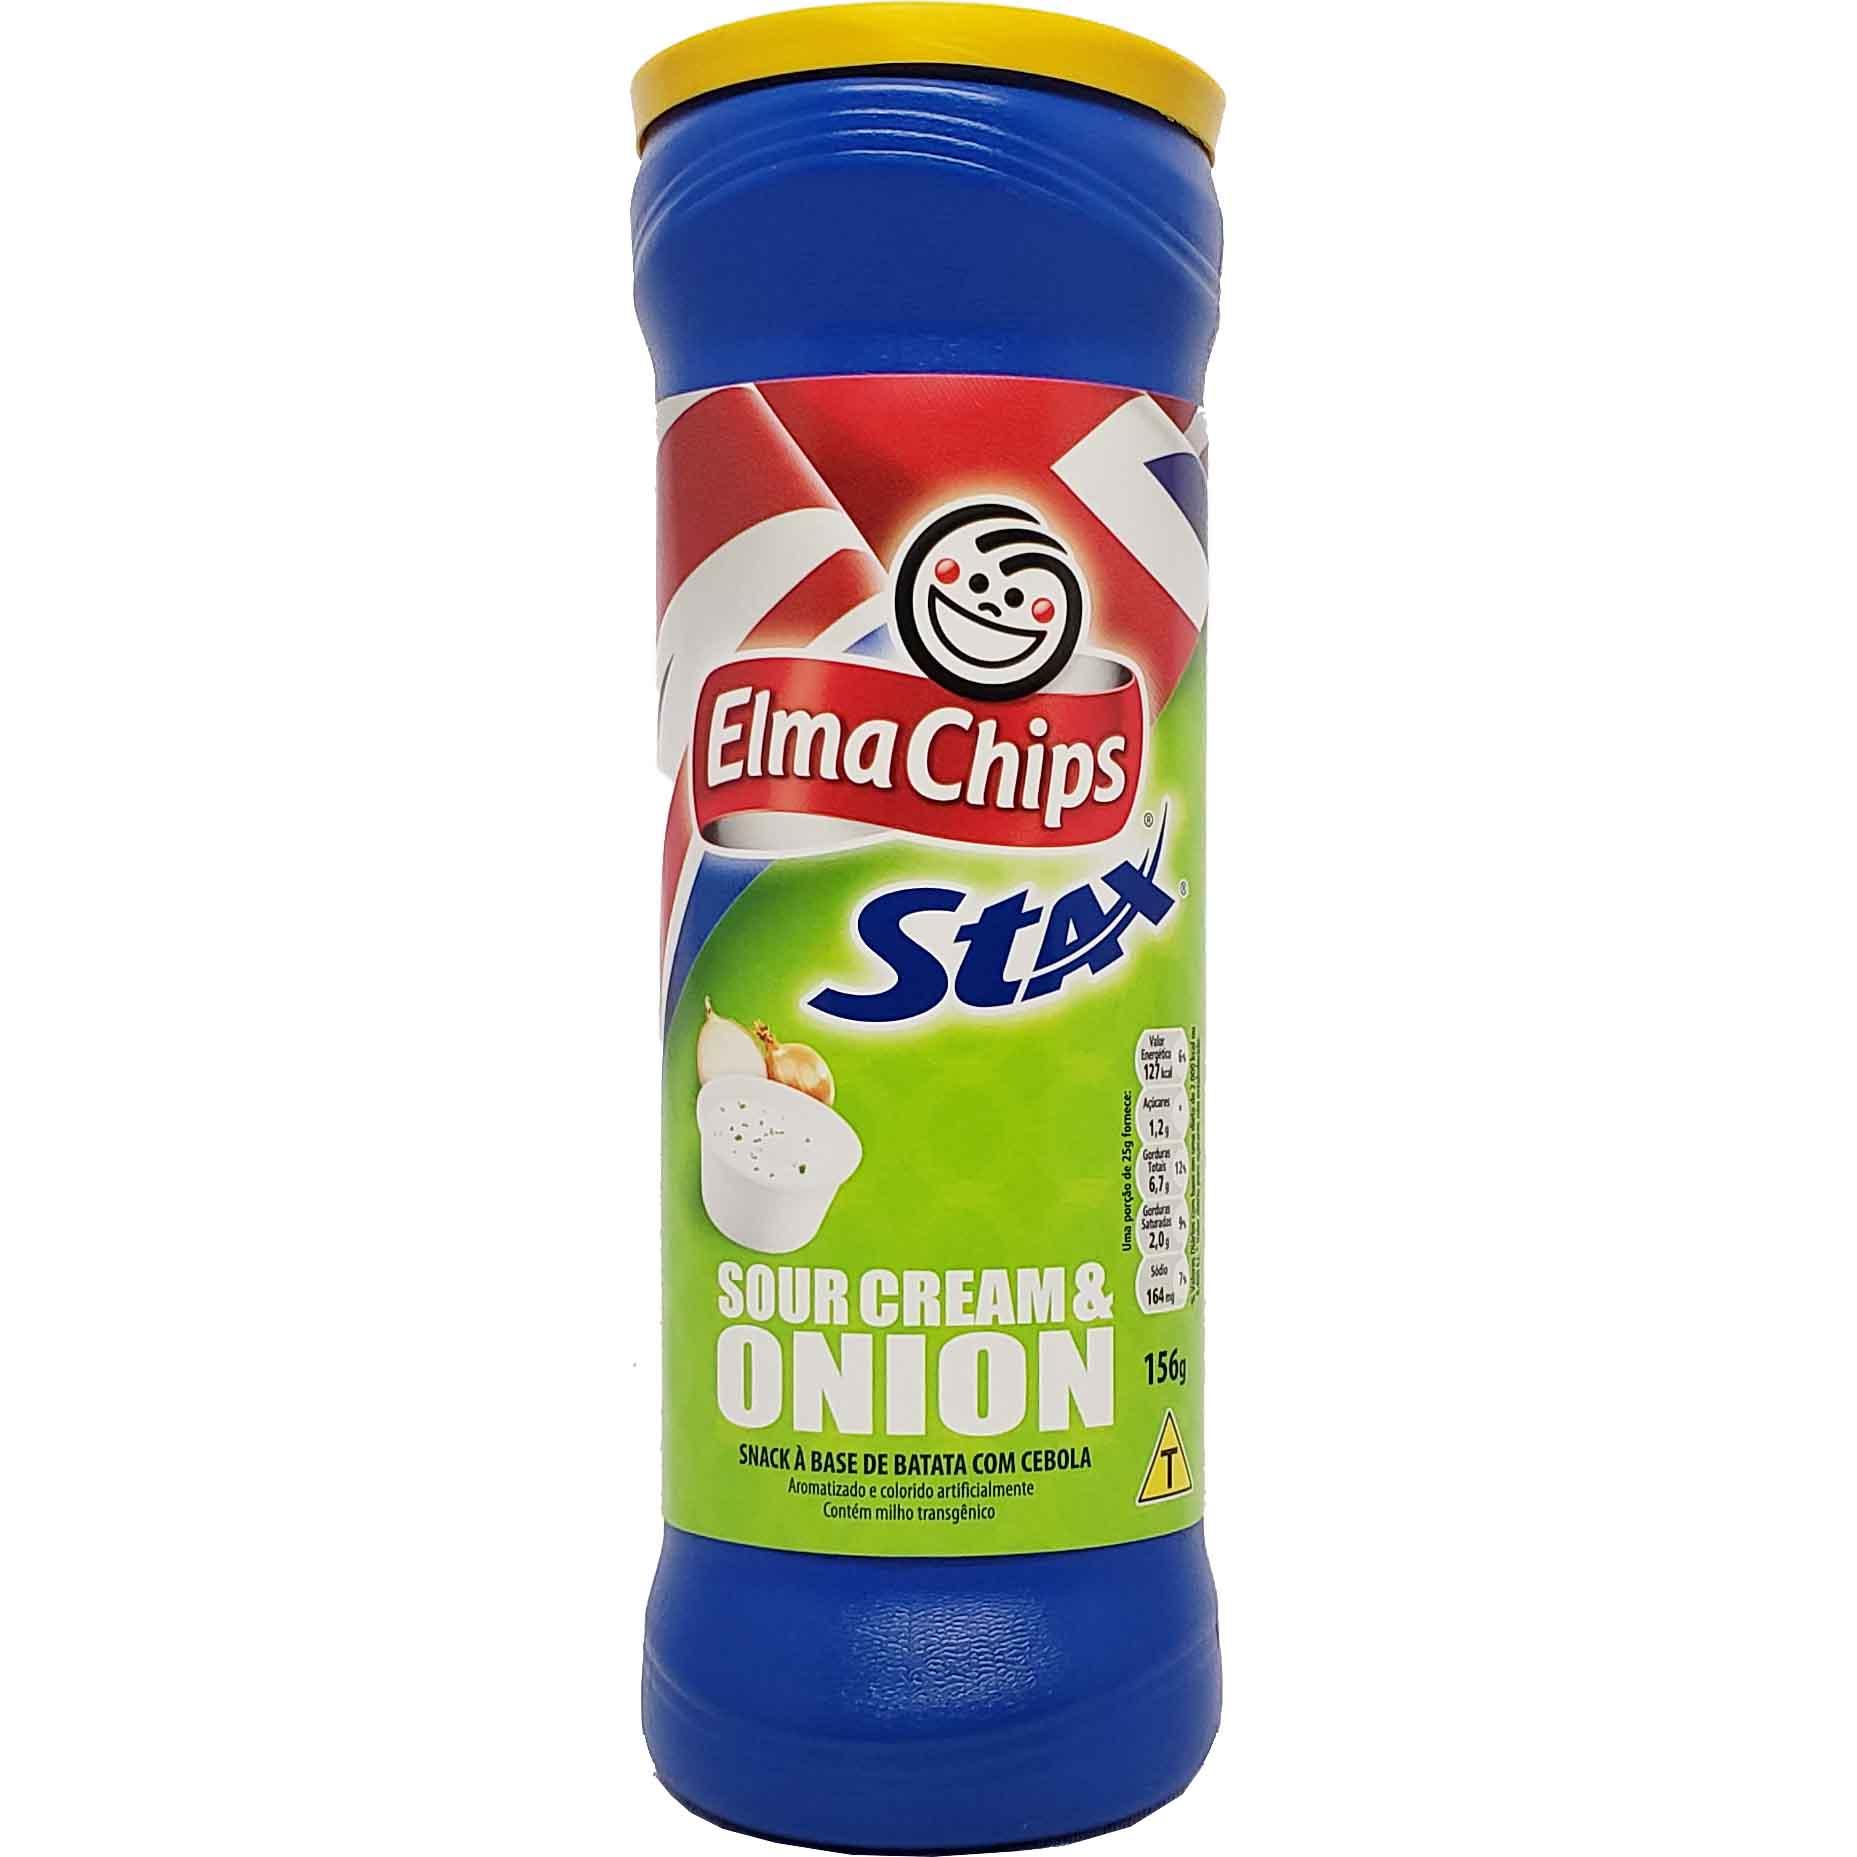 Snack Stax Sour Cream & Onion Elma Chips - 156g -